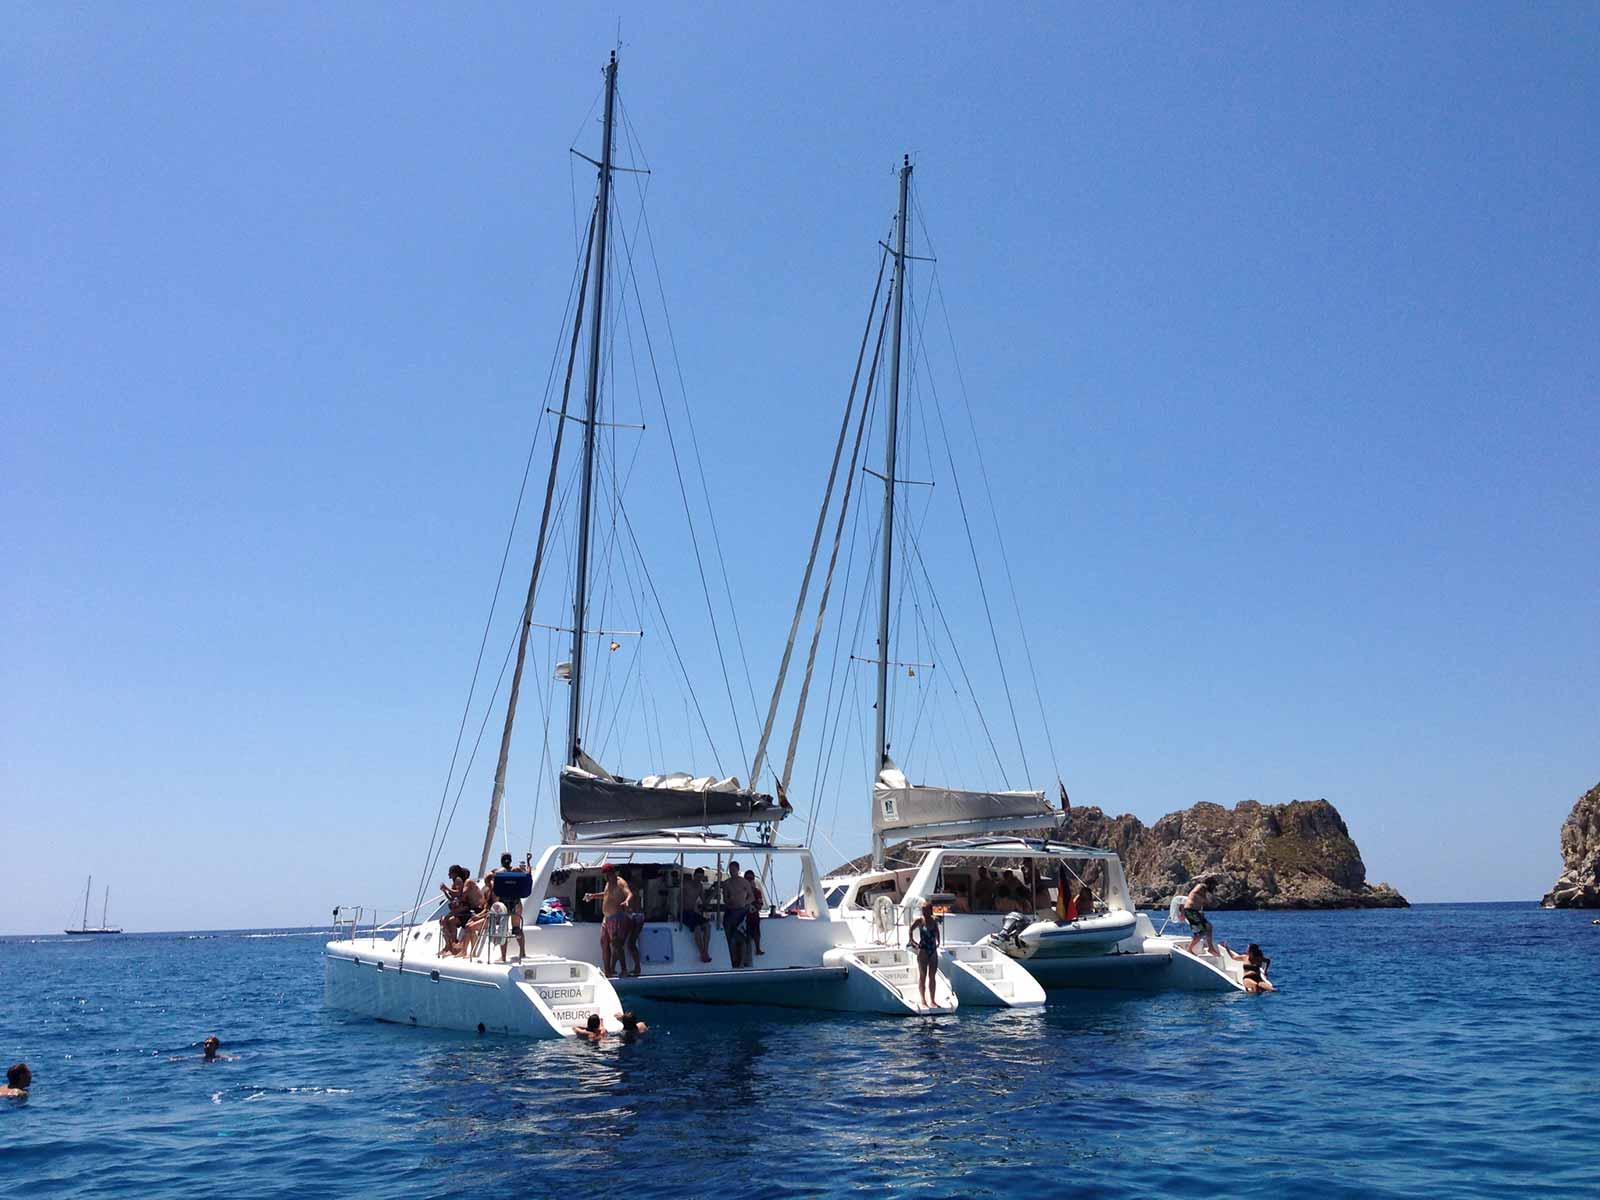 Kleiner-Katamaran-Bootcharter-Mallorca-Katamaran-Mallorca-4